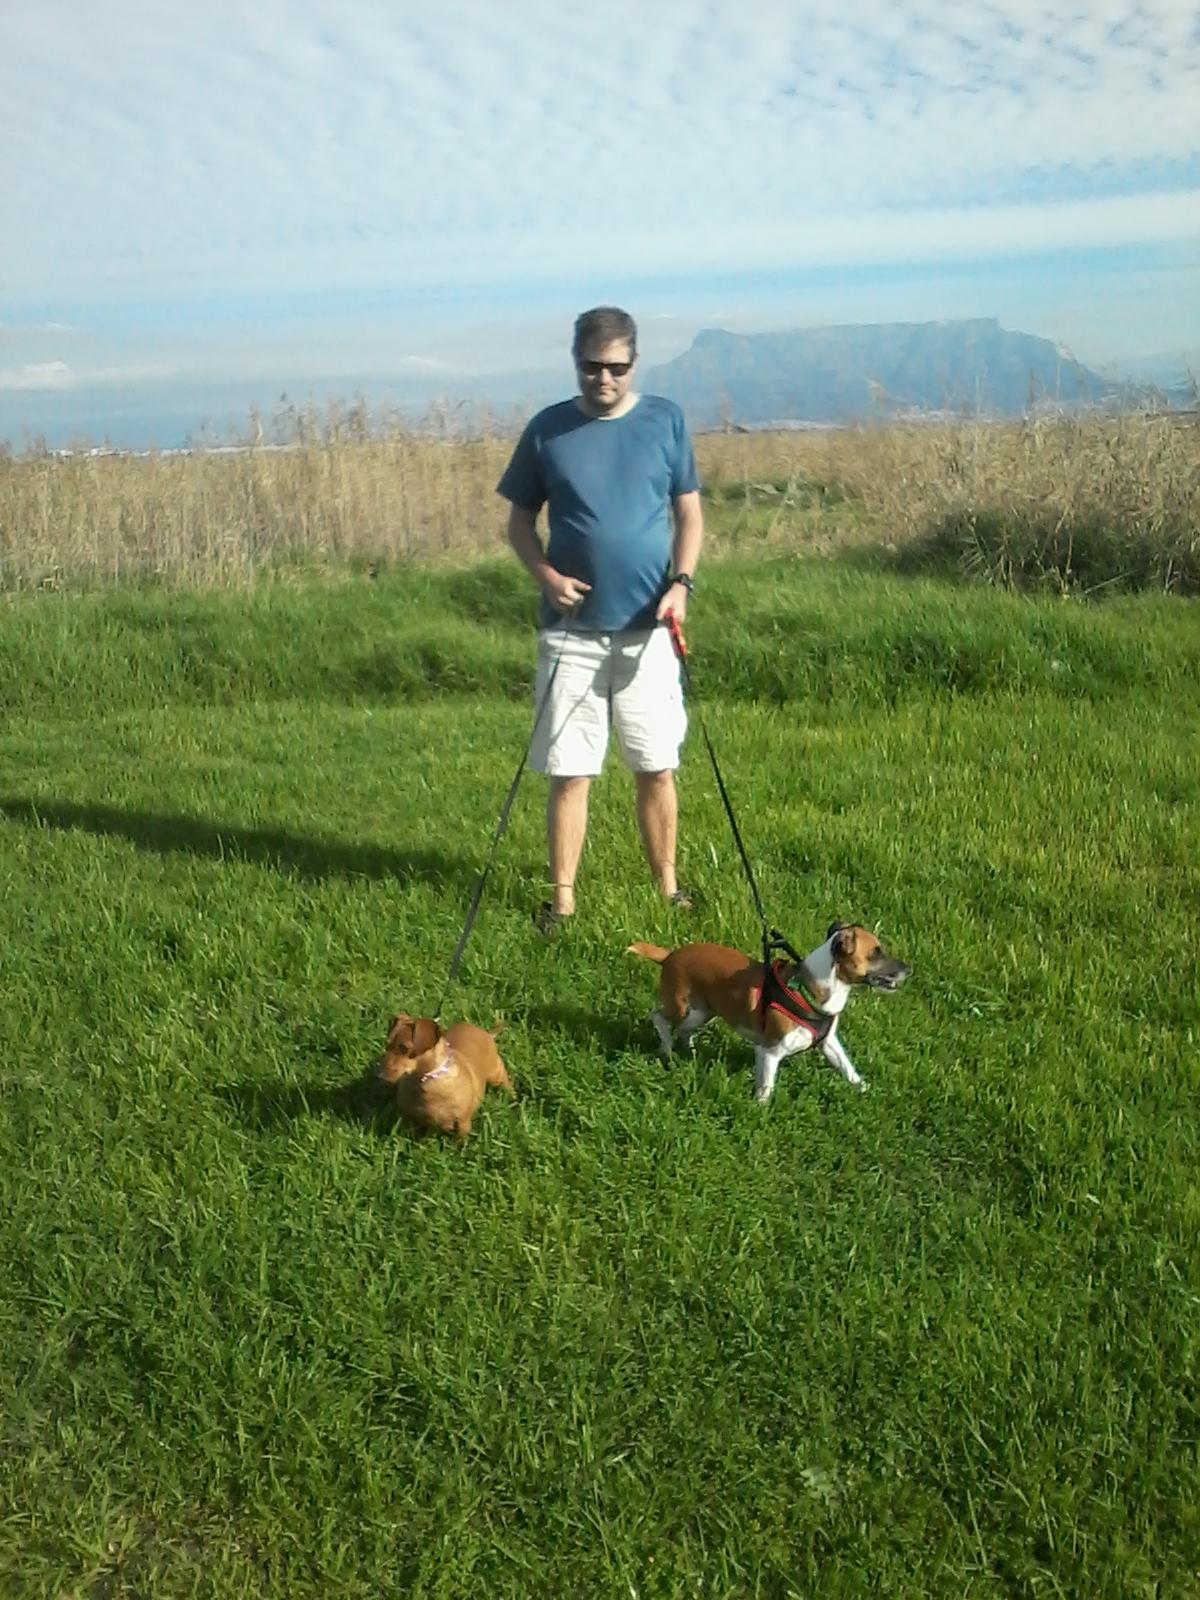 Cheap Wellies Dog Walking